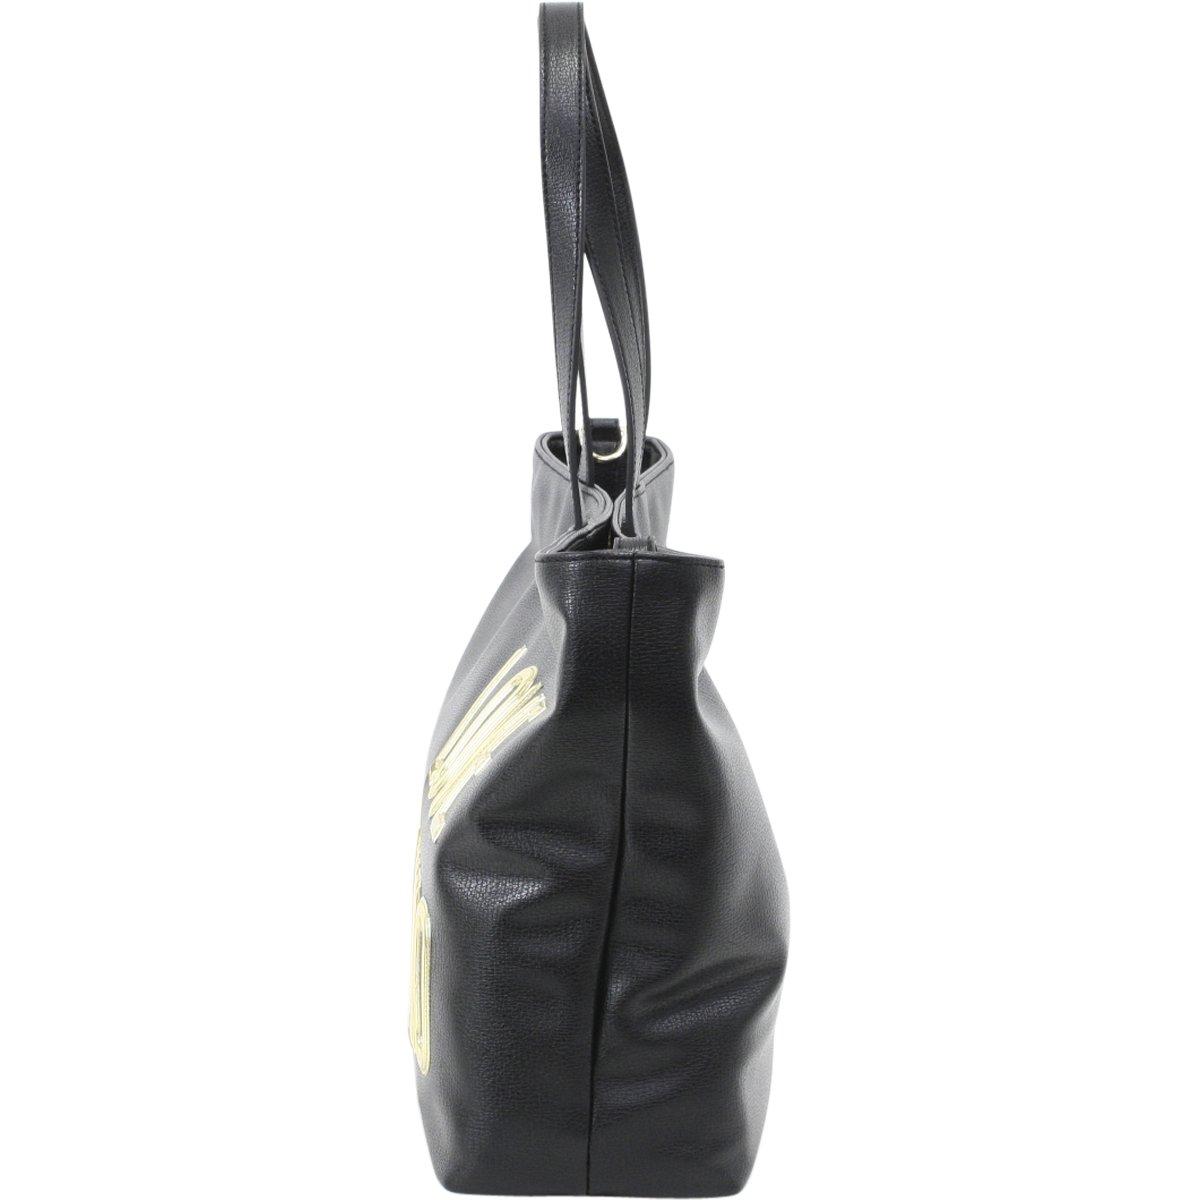 Love Moschino shopping bag Pu black by Love Moschino (Image #1)